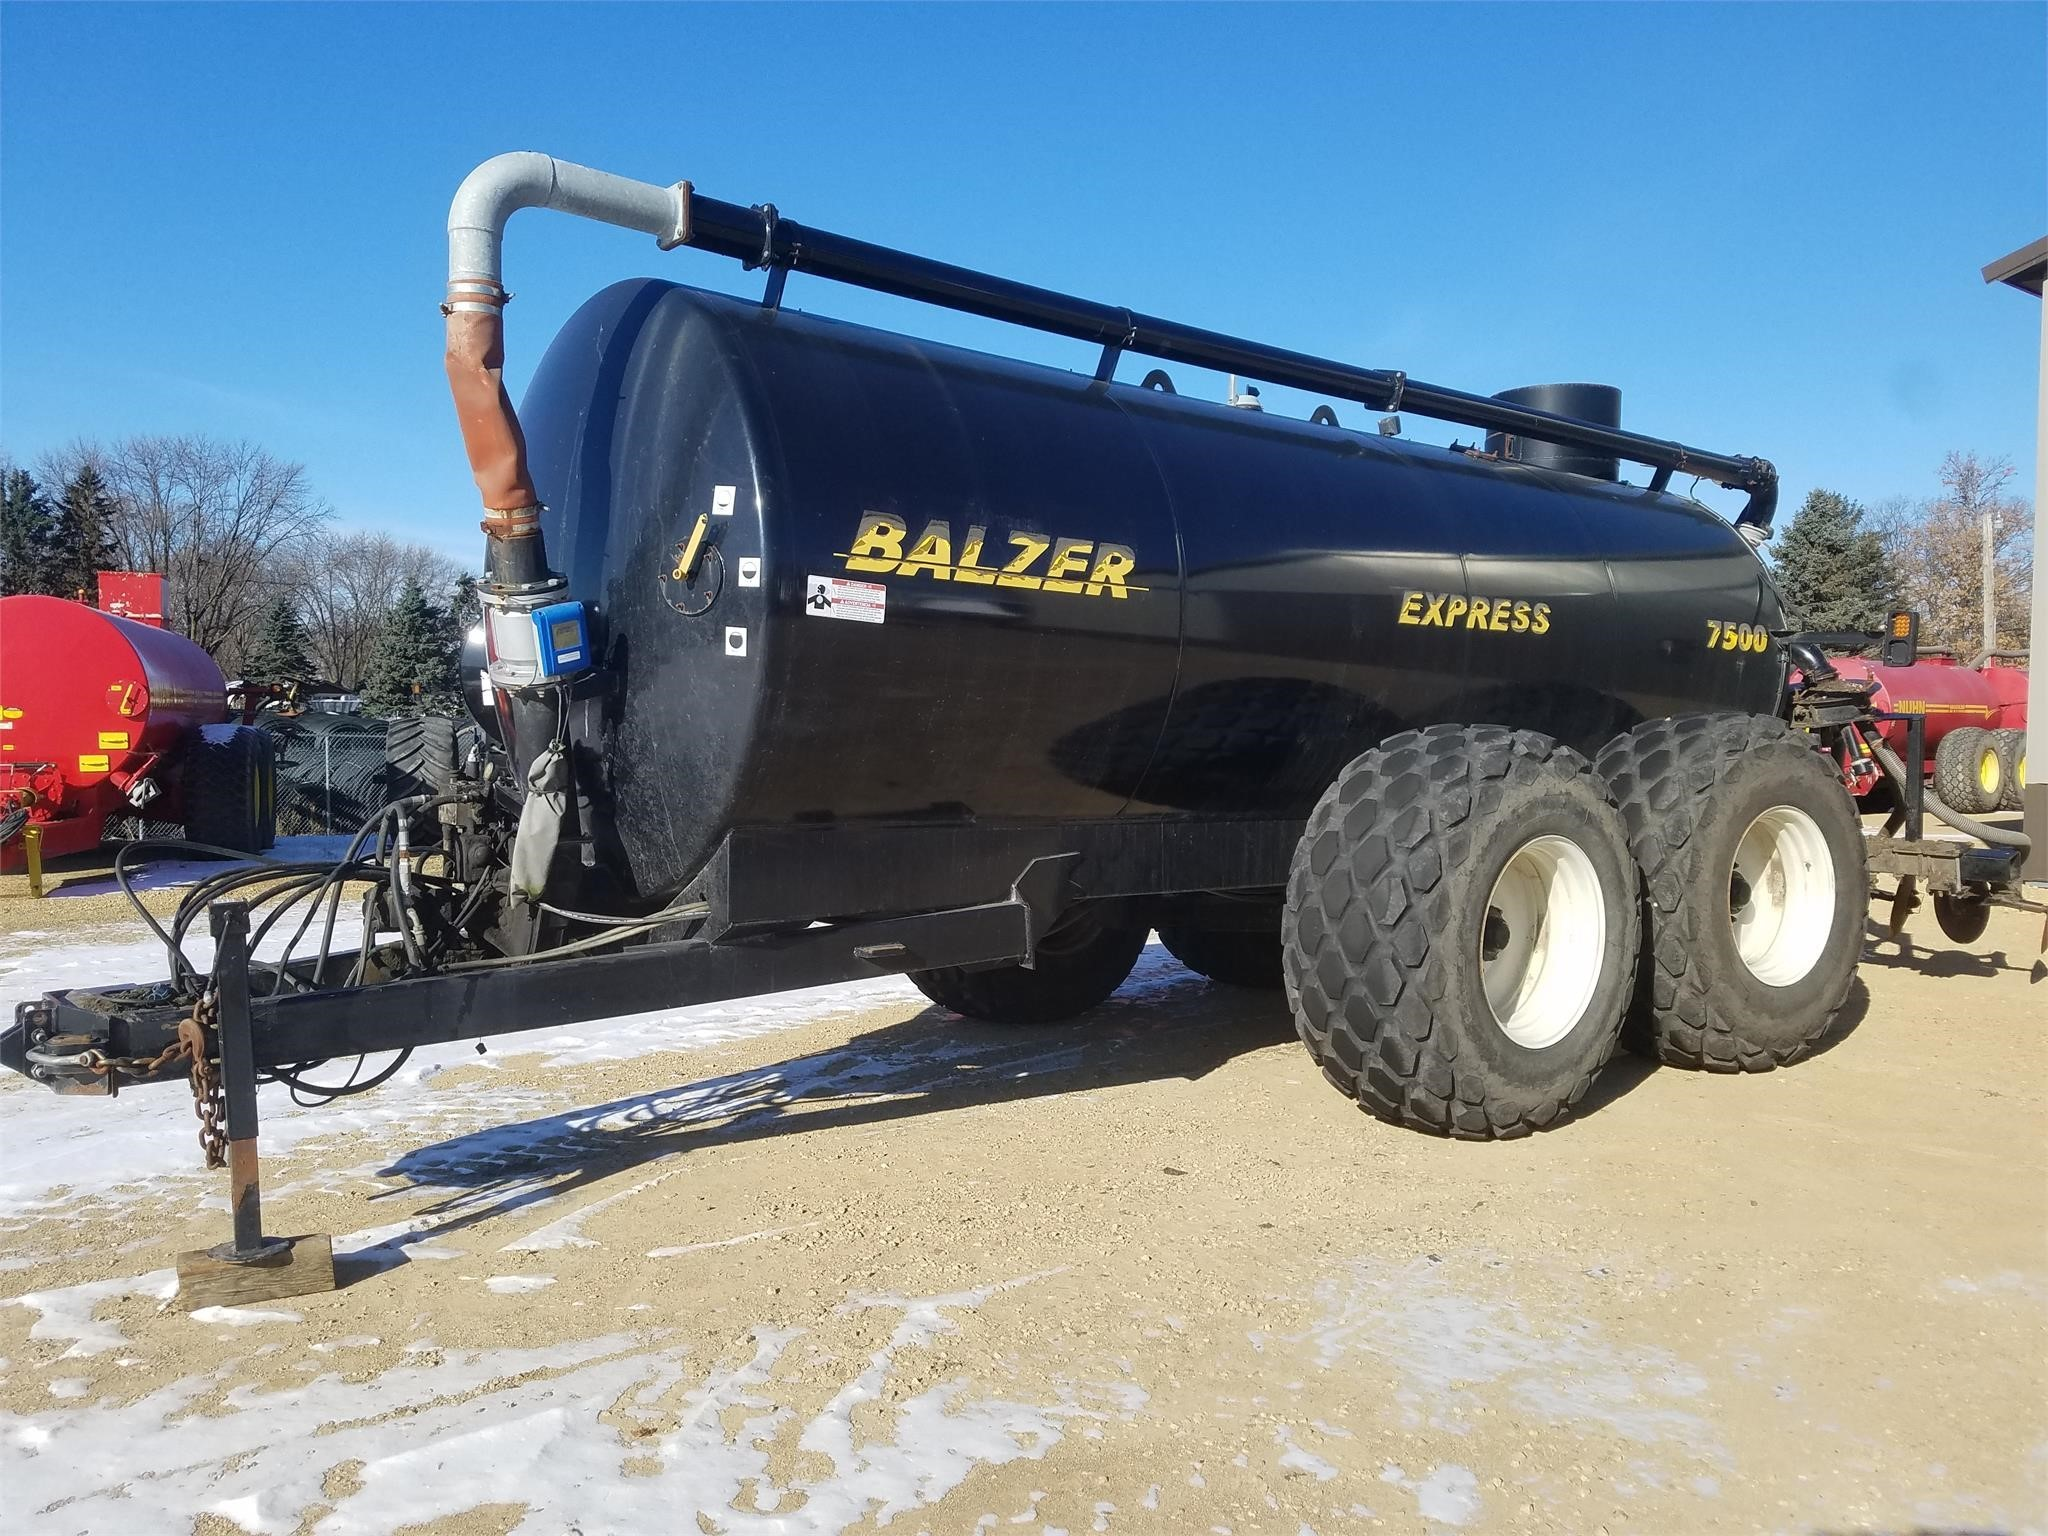 Balzer 7500 Express Manure Spreader